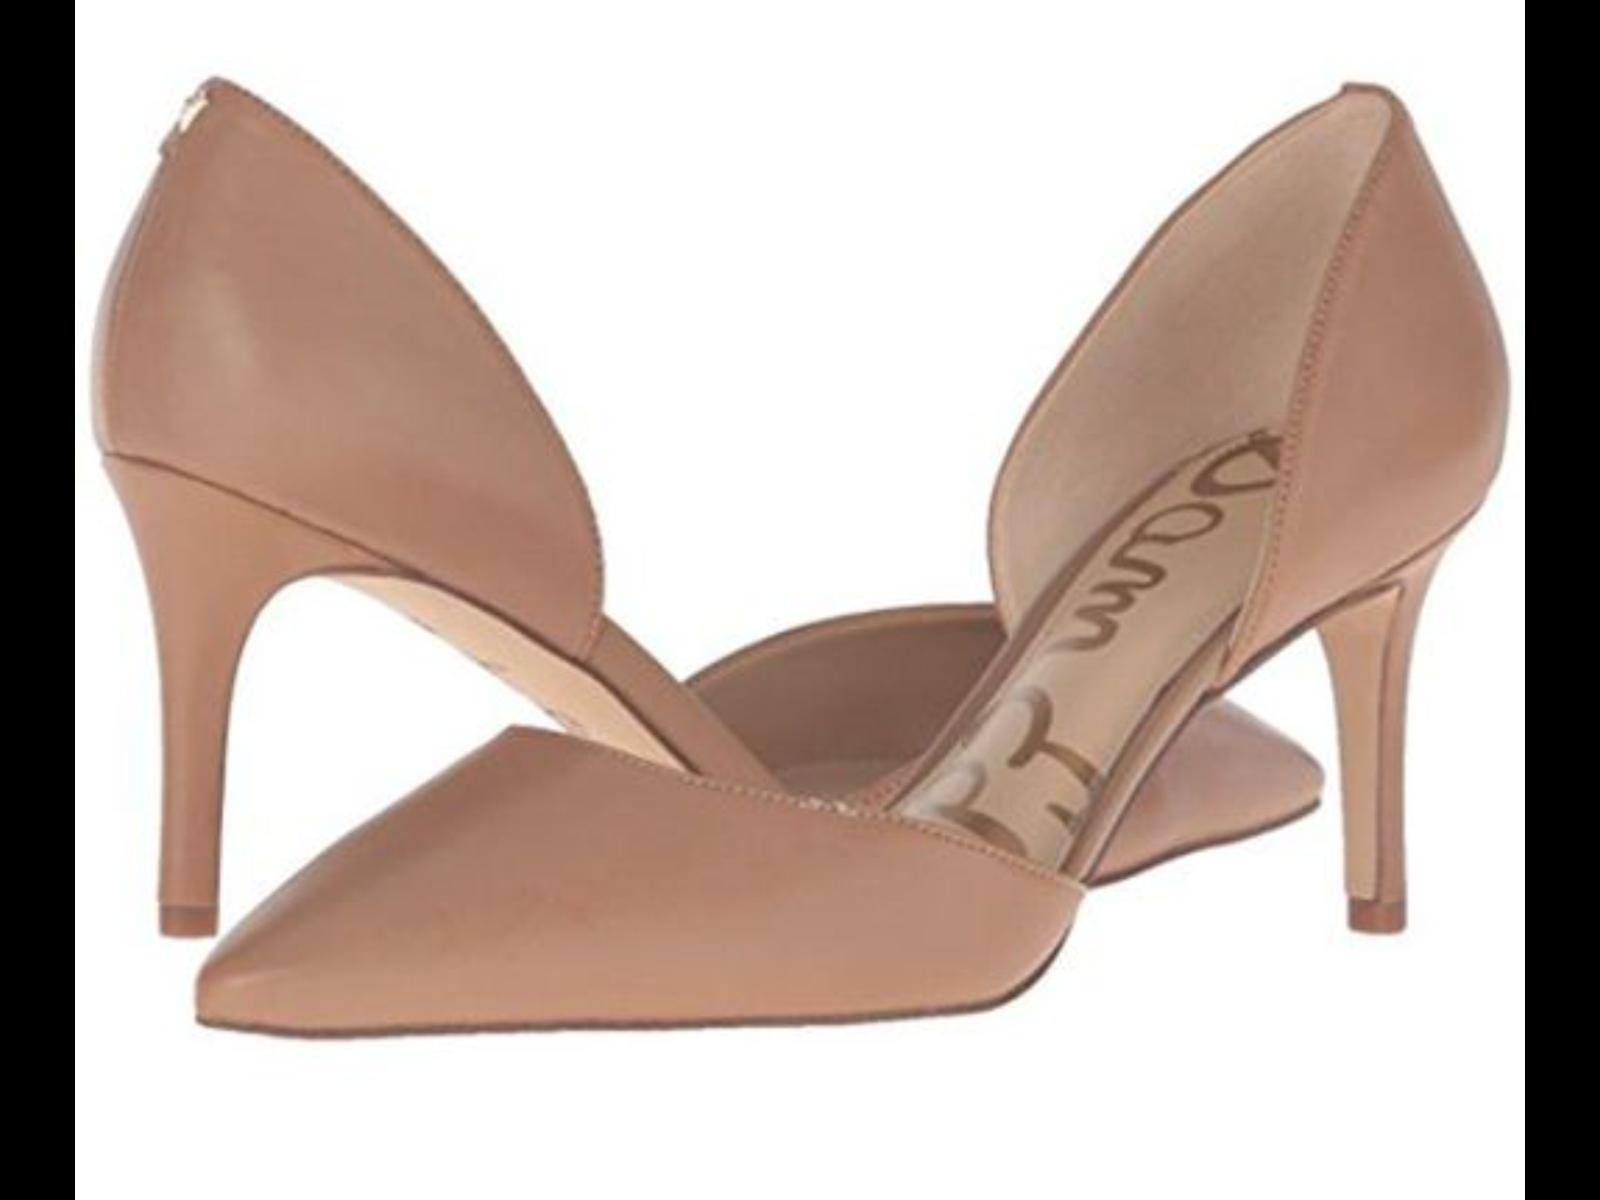 cfb372d08 Sam Edelman Women s Telsa D Orsay Pumps High Heel Pointed Toe Beige ...